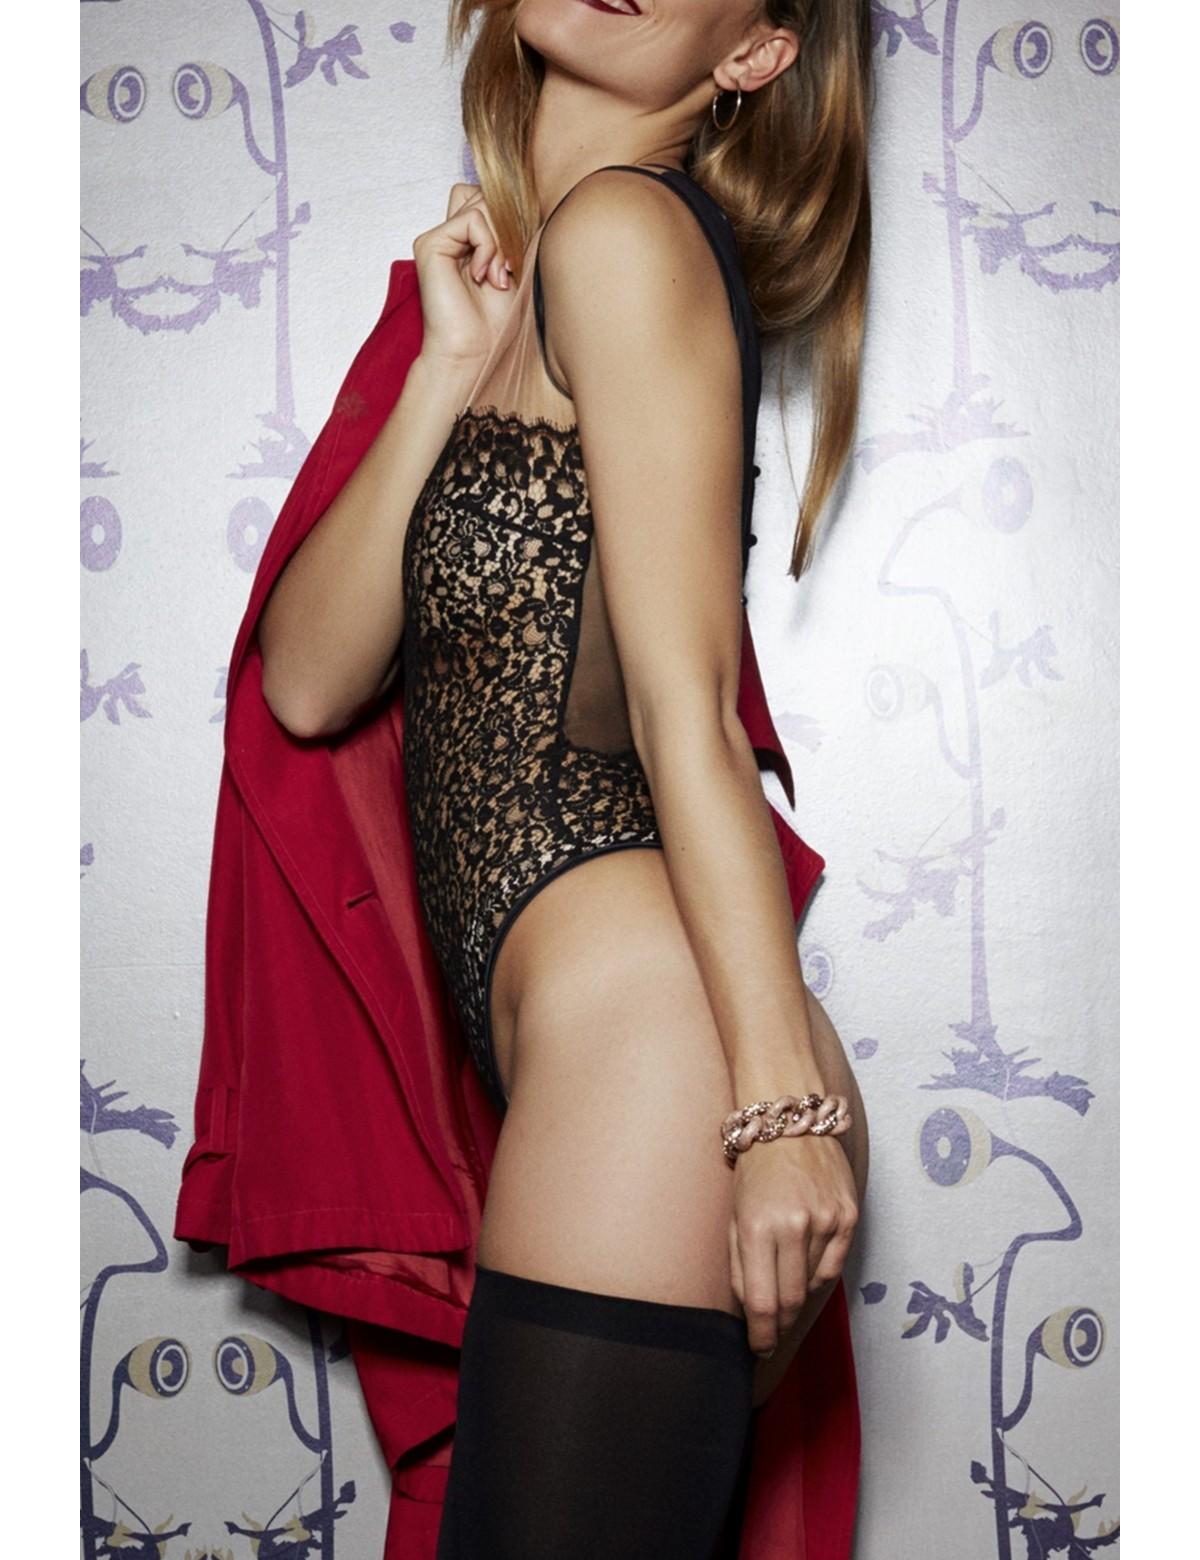 lesjupons-Tess-Paris-lingerie-sexy-chic-française- 9538c17a75f